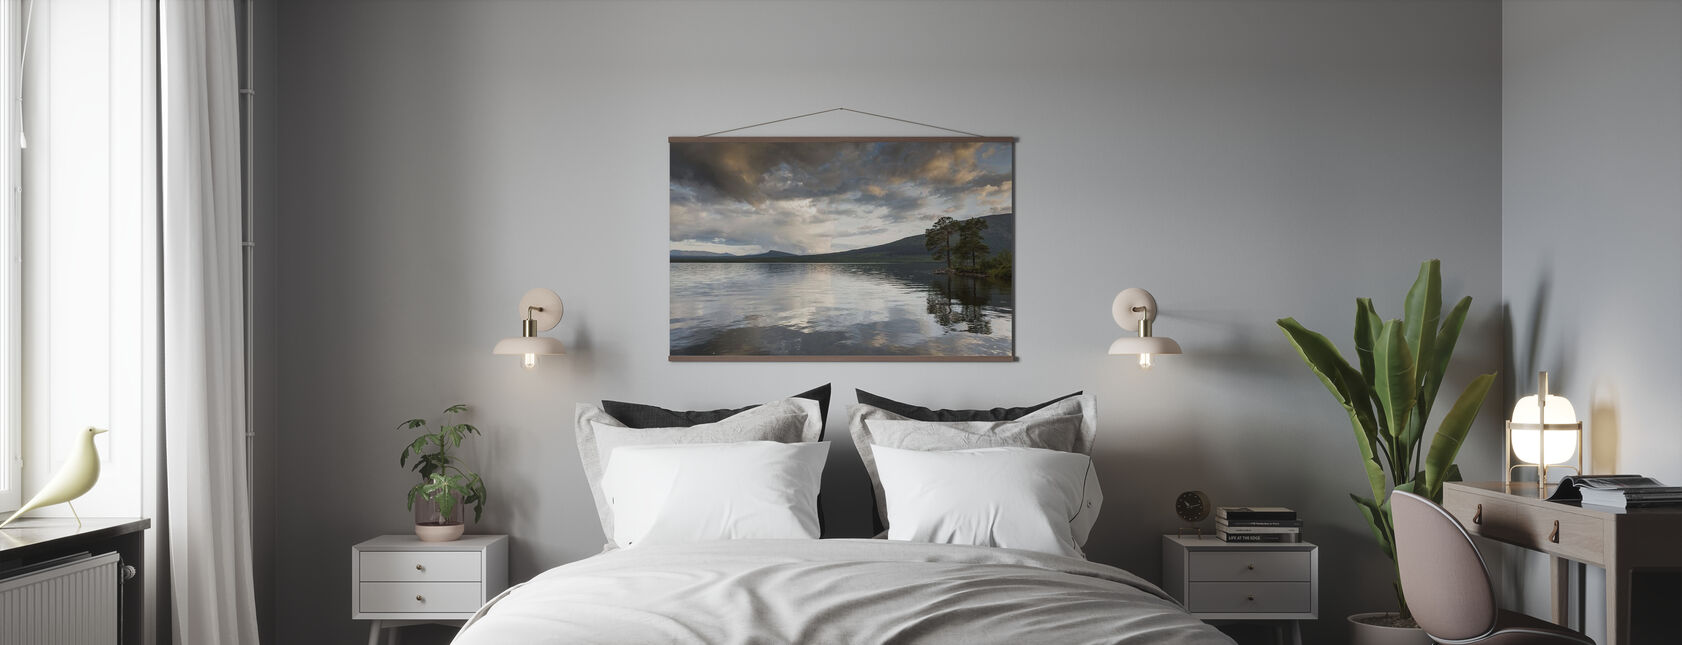 Jamtland Lake - Plakat - Soverom